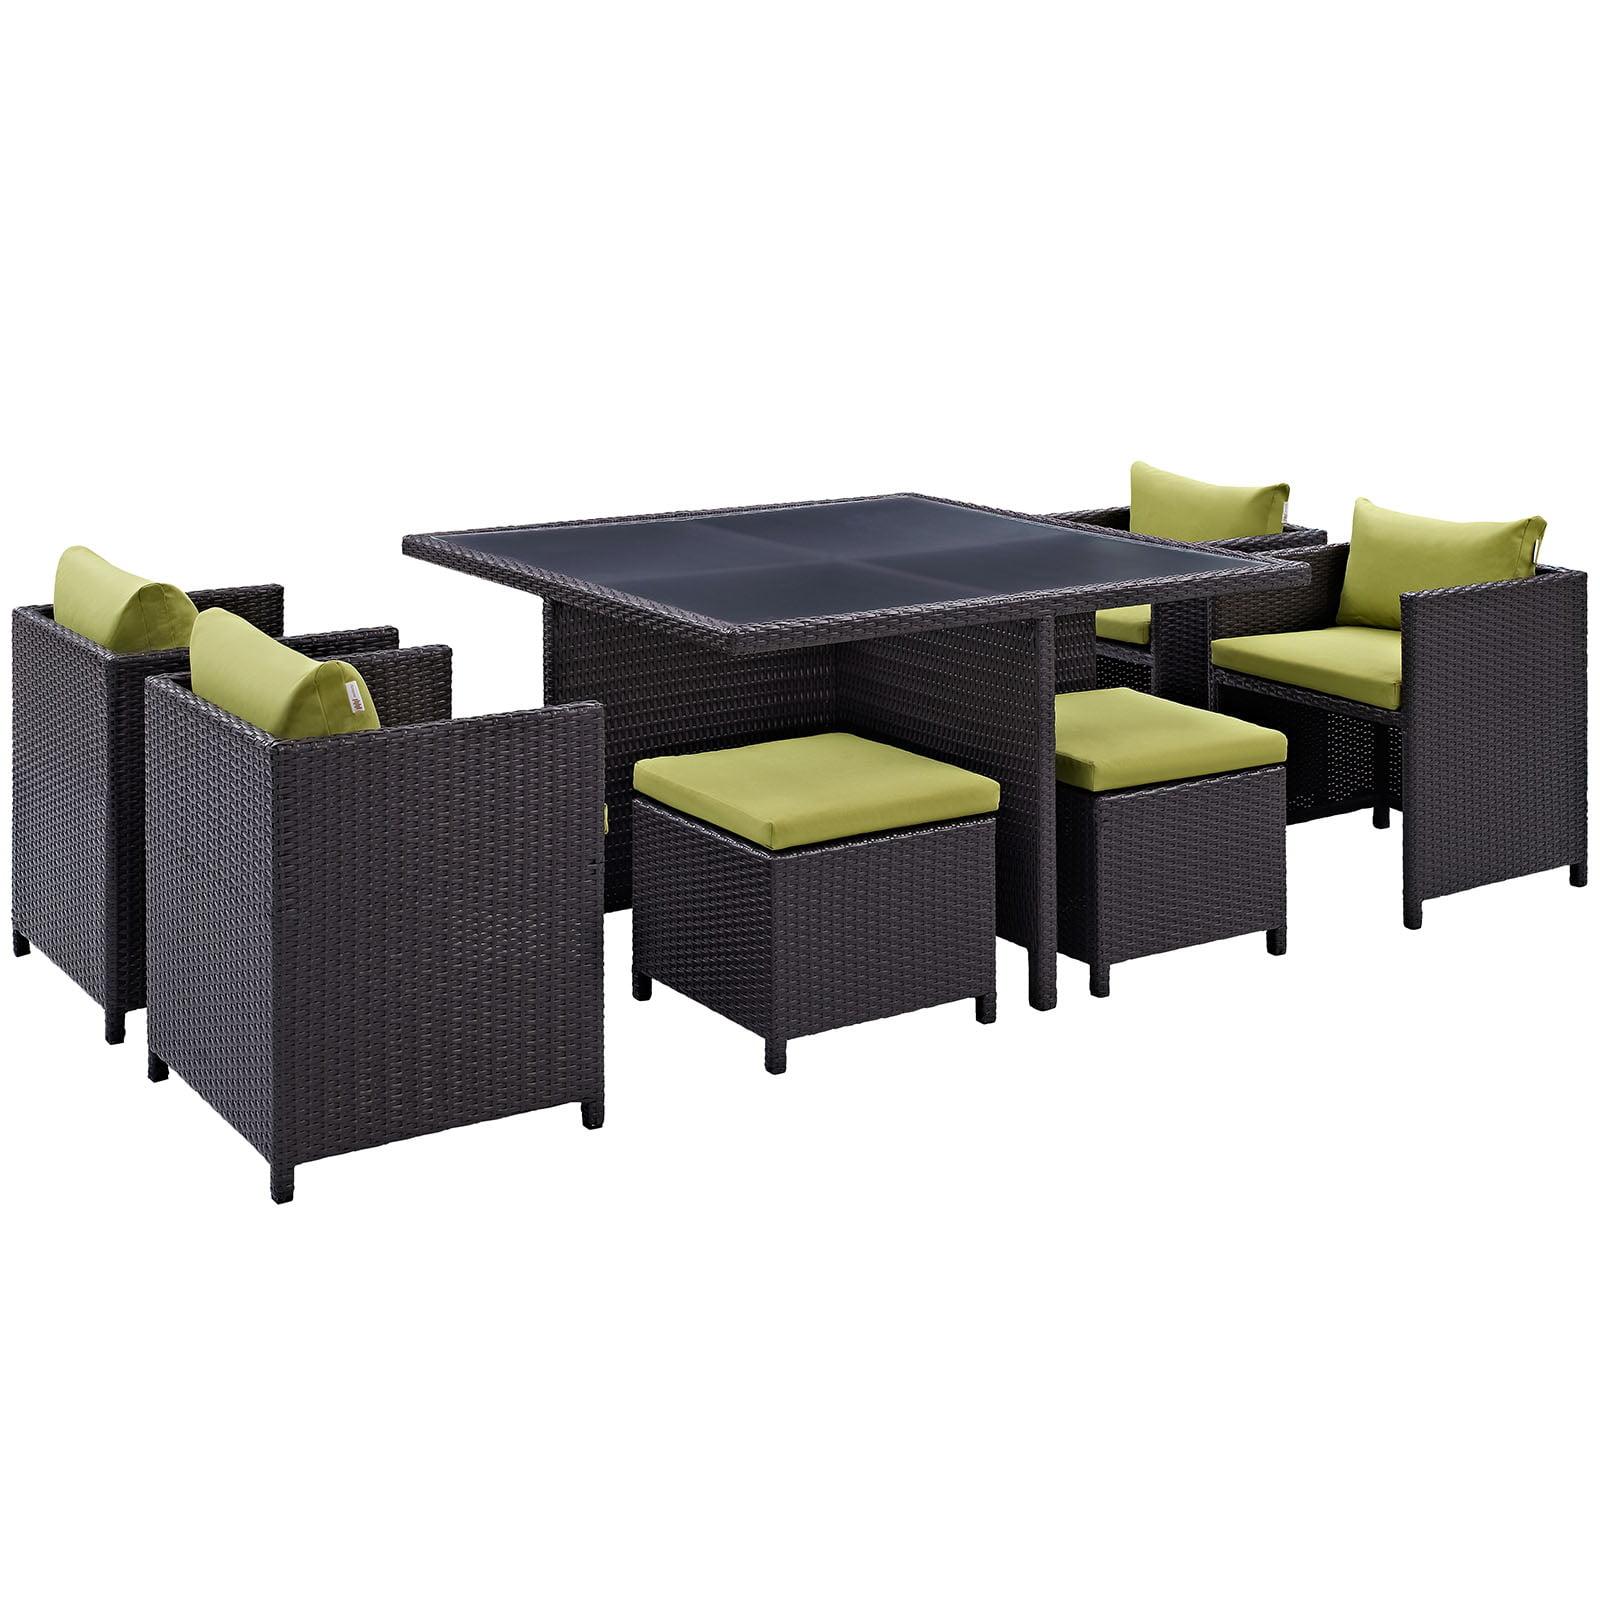 Modern Contemporary 9 Pcs Outdoor Patio Dining Set, Green Plastic